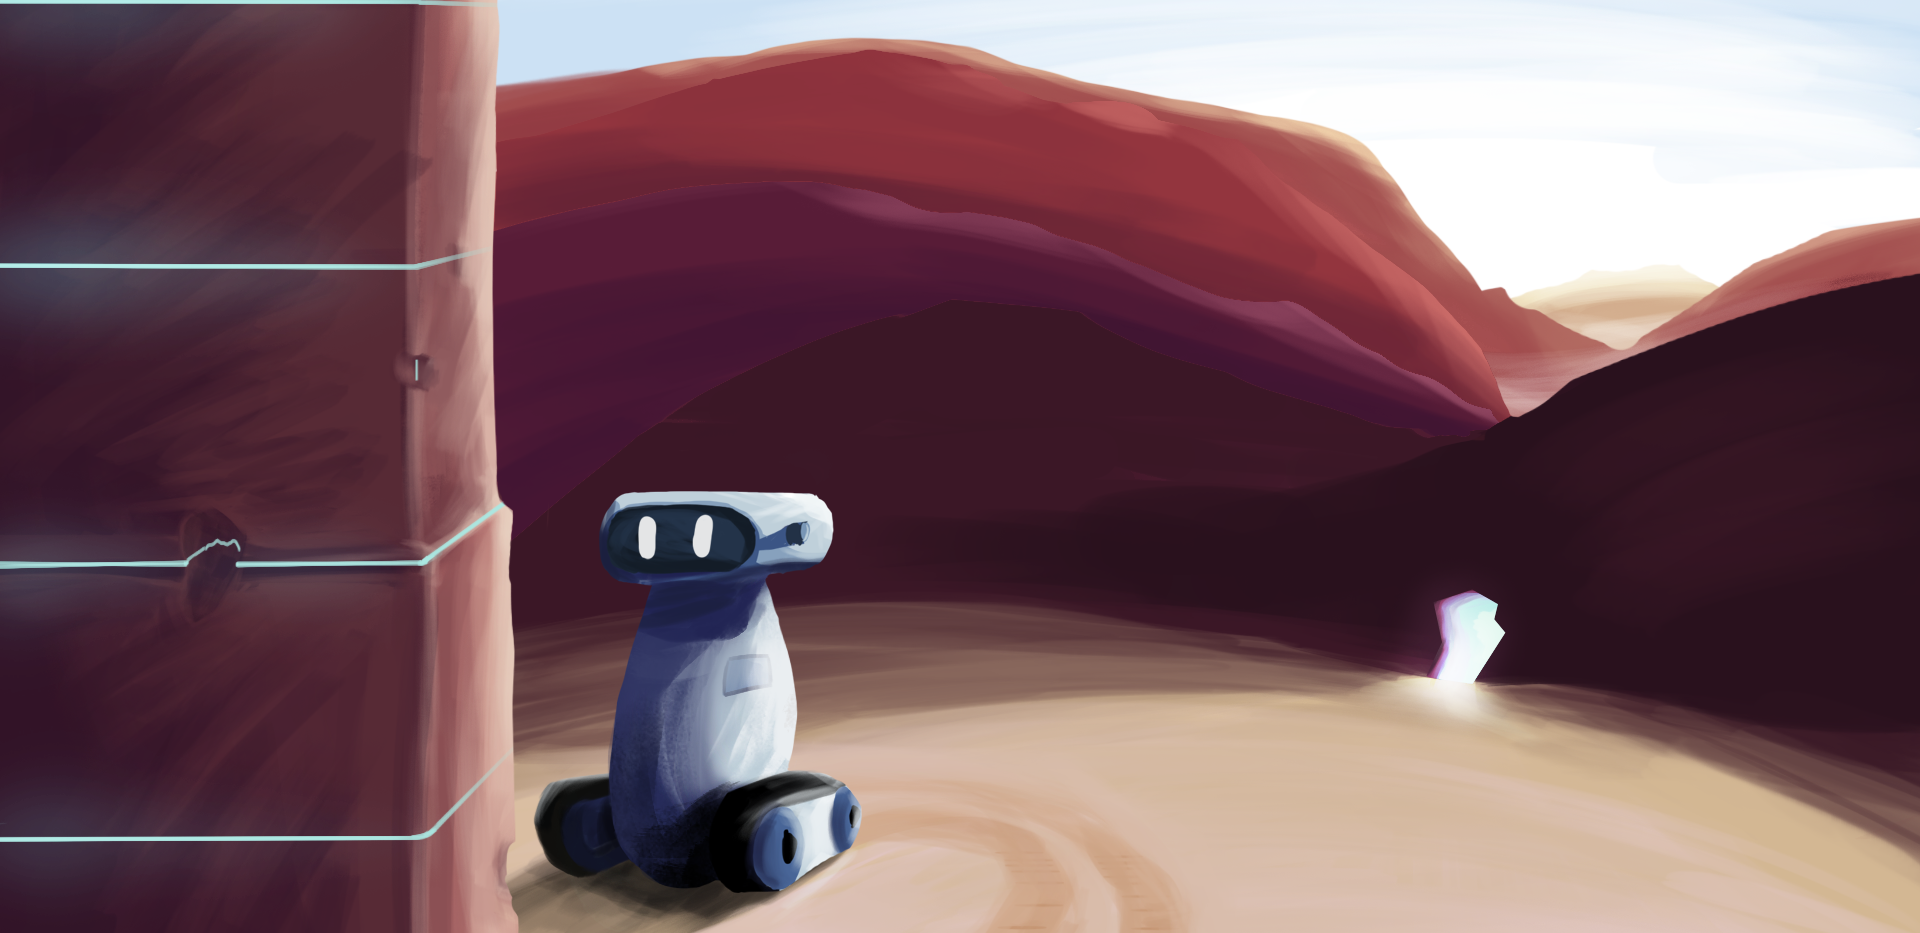 DEV1- ROBOT-DECOR illu_robot.png